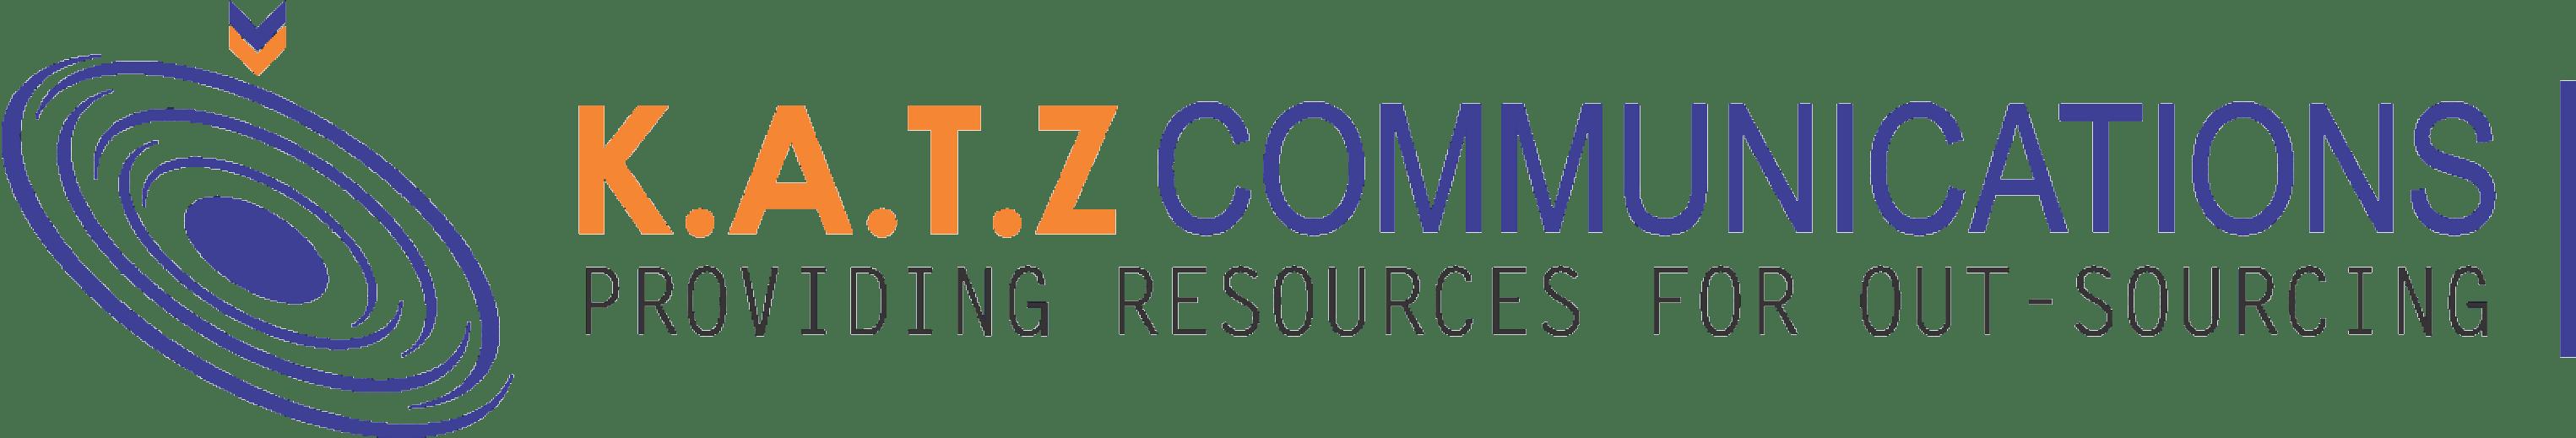 KATZ Communications